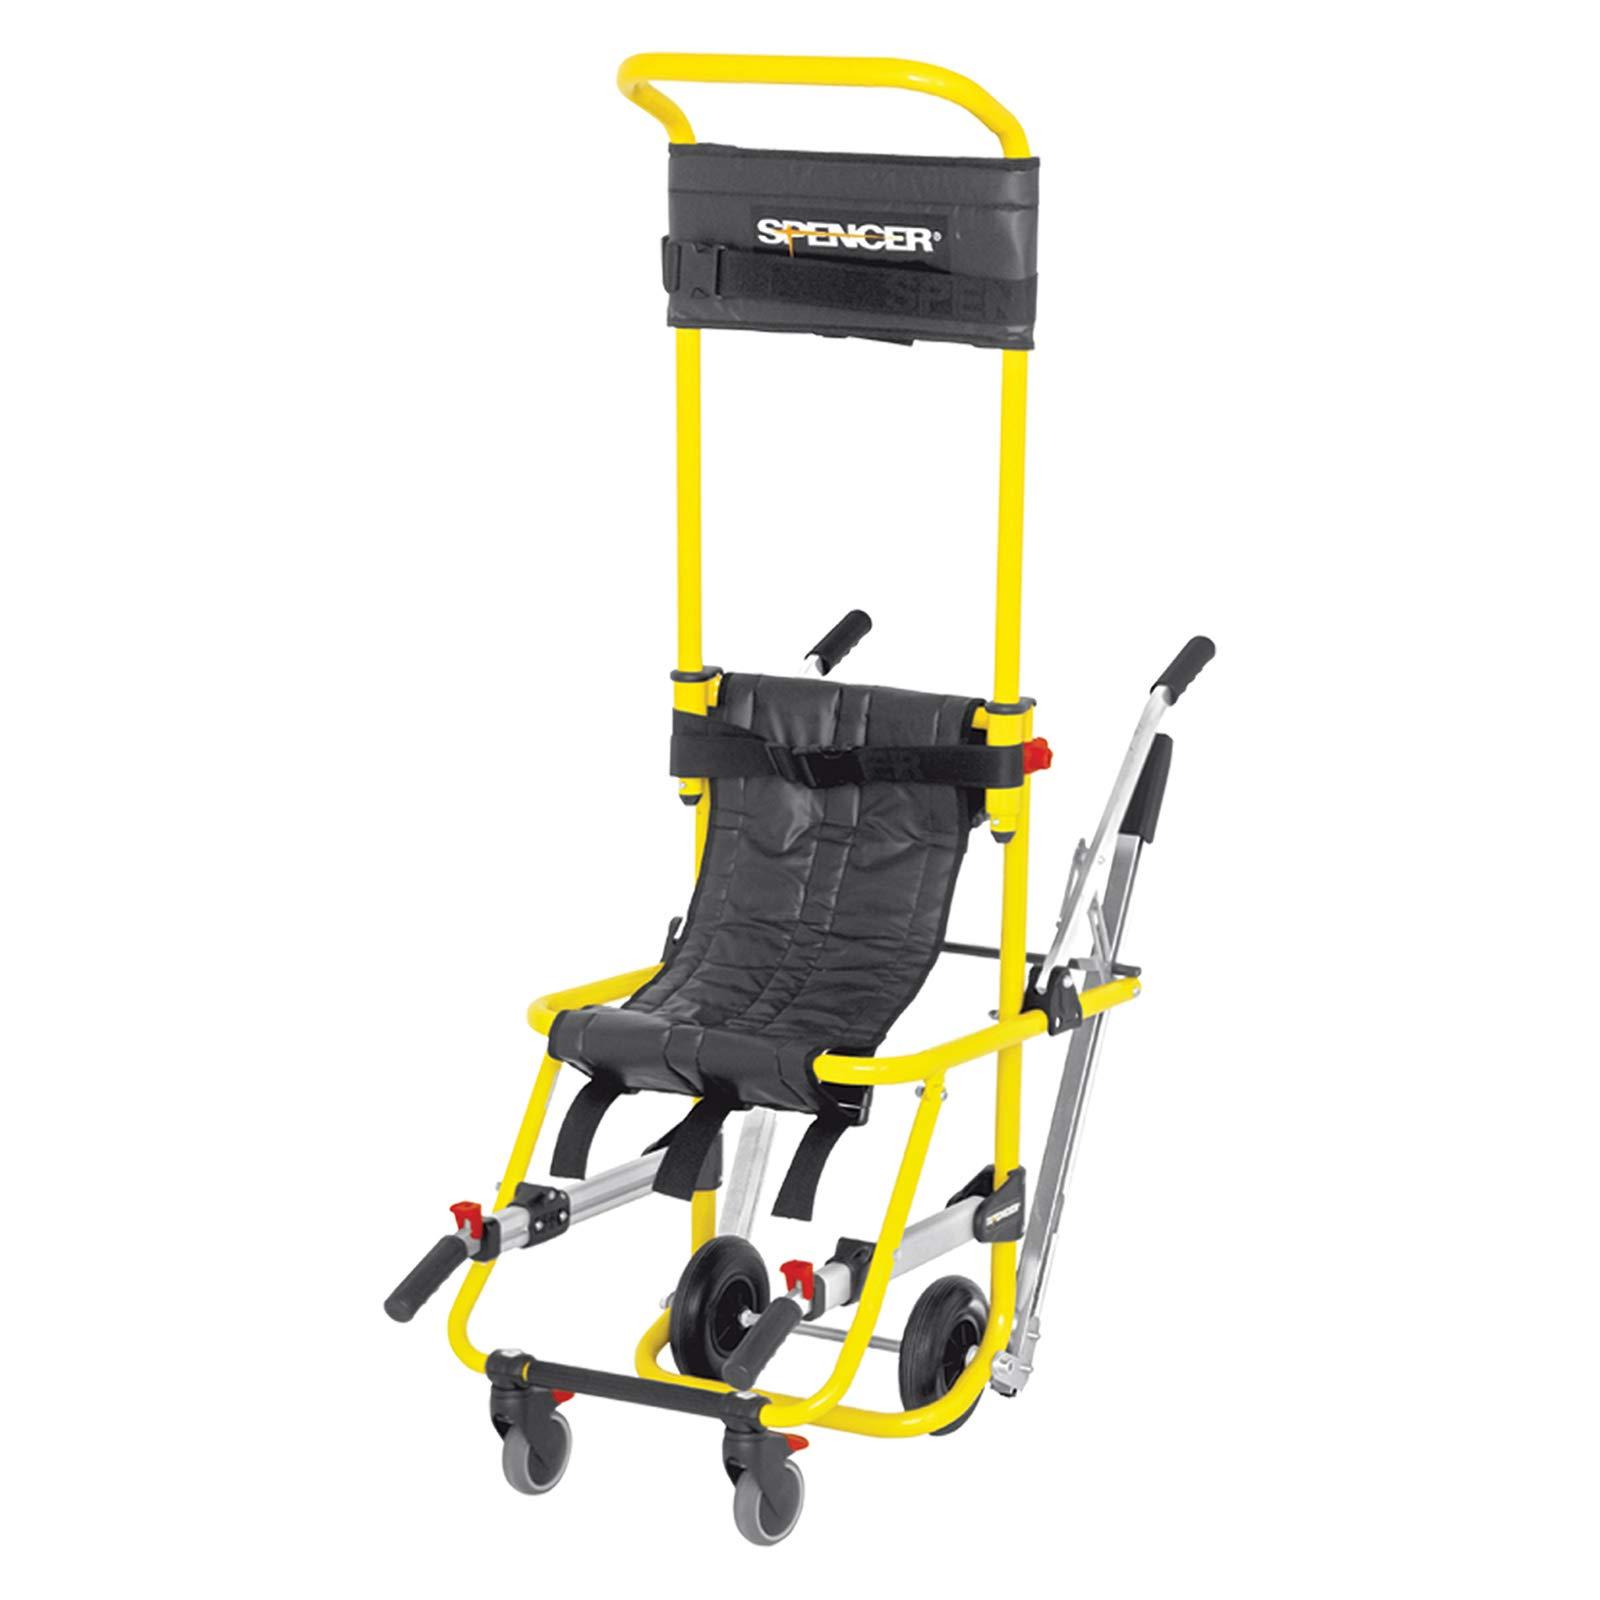 Spencer Italia SK10001 E Yellow Pro Skid Evacuation Chair